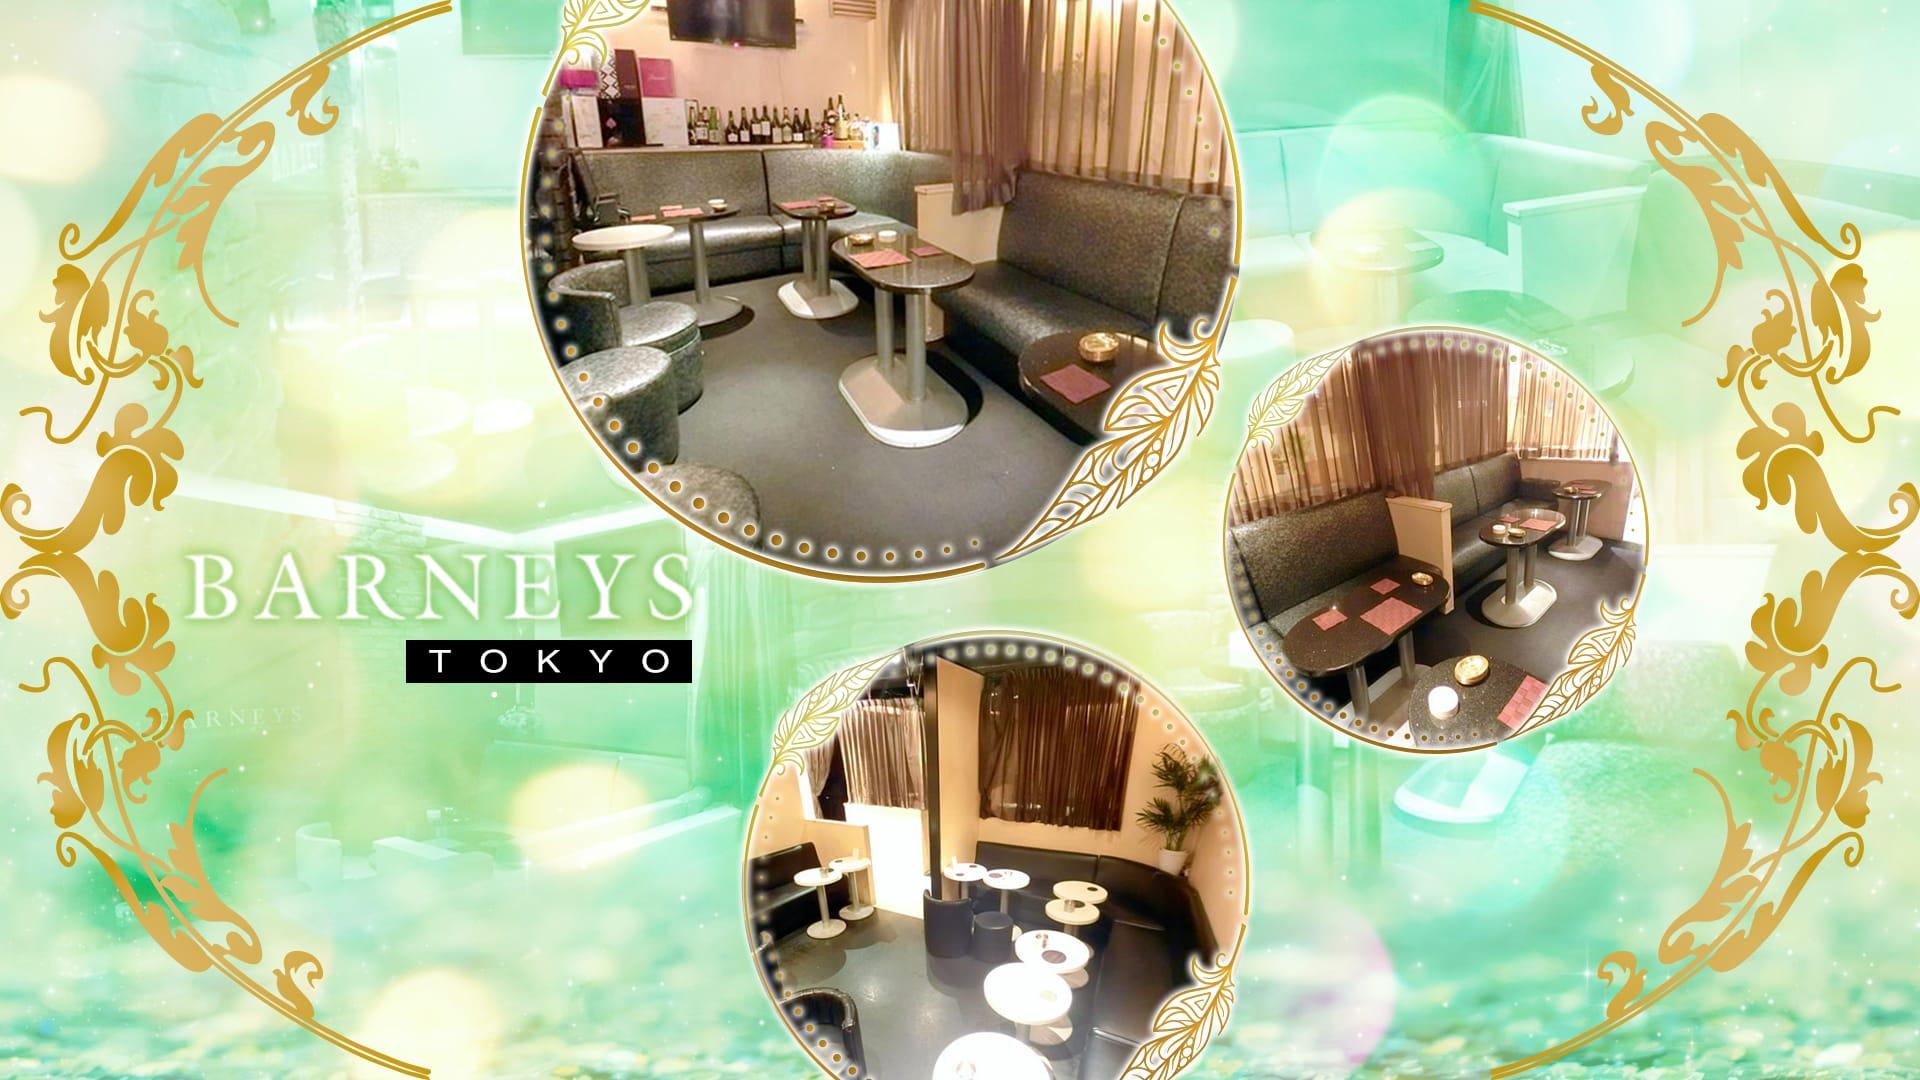 NEW CLUB BARNEYS TOKYO(ニュークラブ バーニーズトーキョー) 渋谷キャバクラ TOP画像